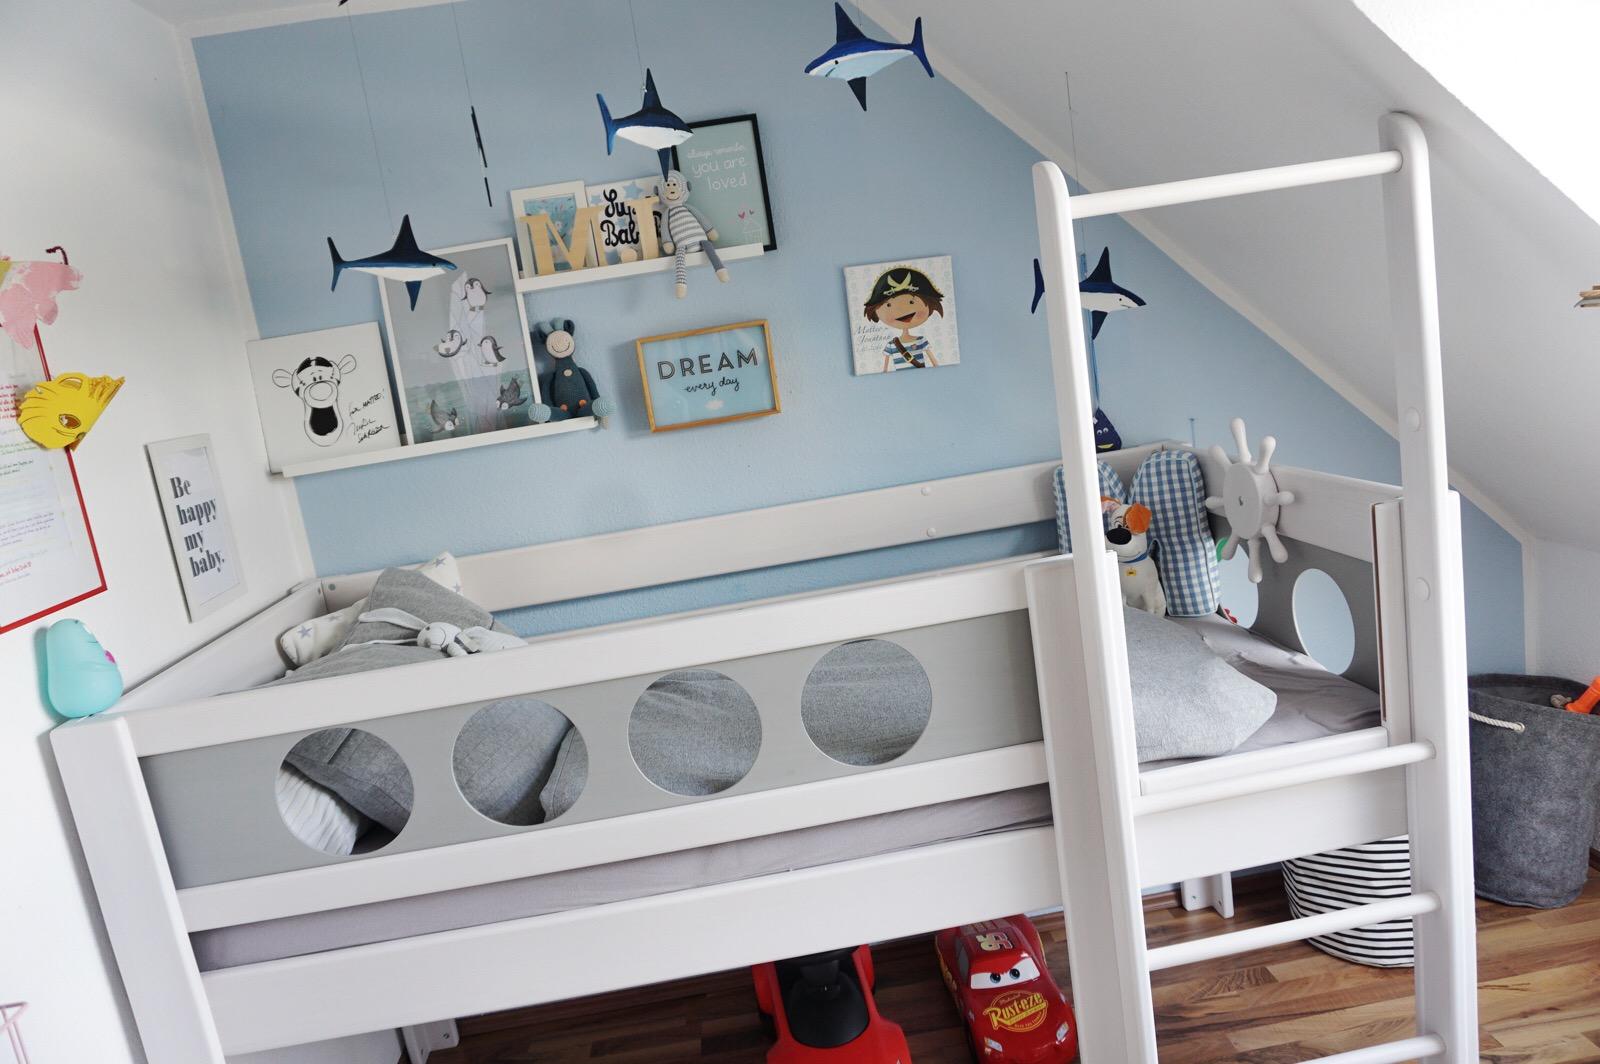 Full Size of Piratenhochbett Piratenbett Hochbett Kinderzimmer Debreuyn Regale Sofa Regal Weiß Kinderzimmer Hochbett Kinderzimmer